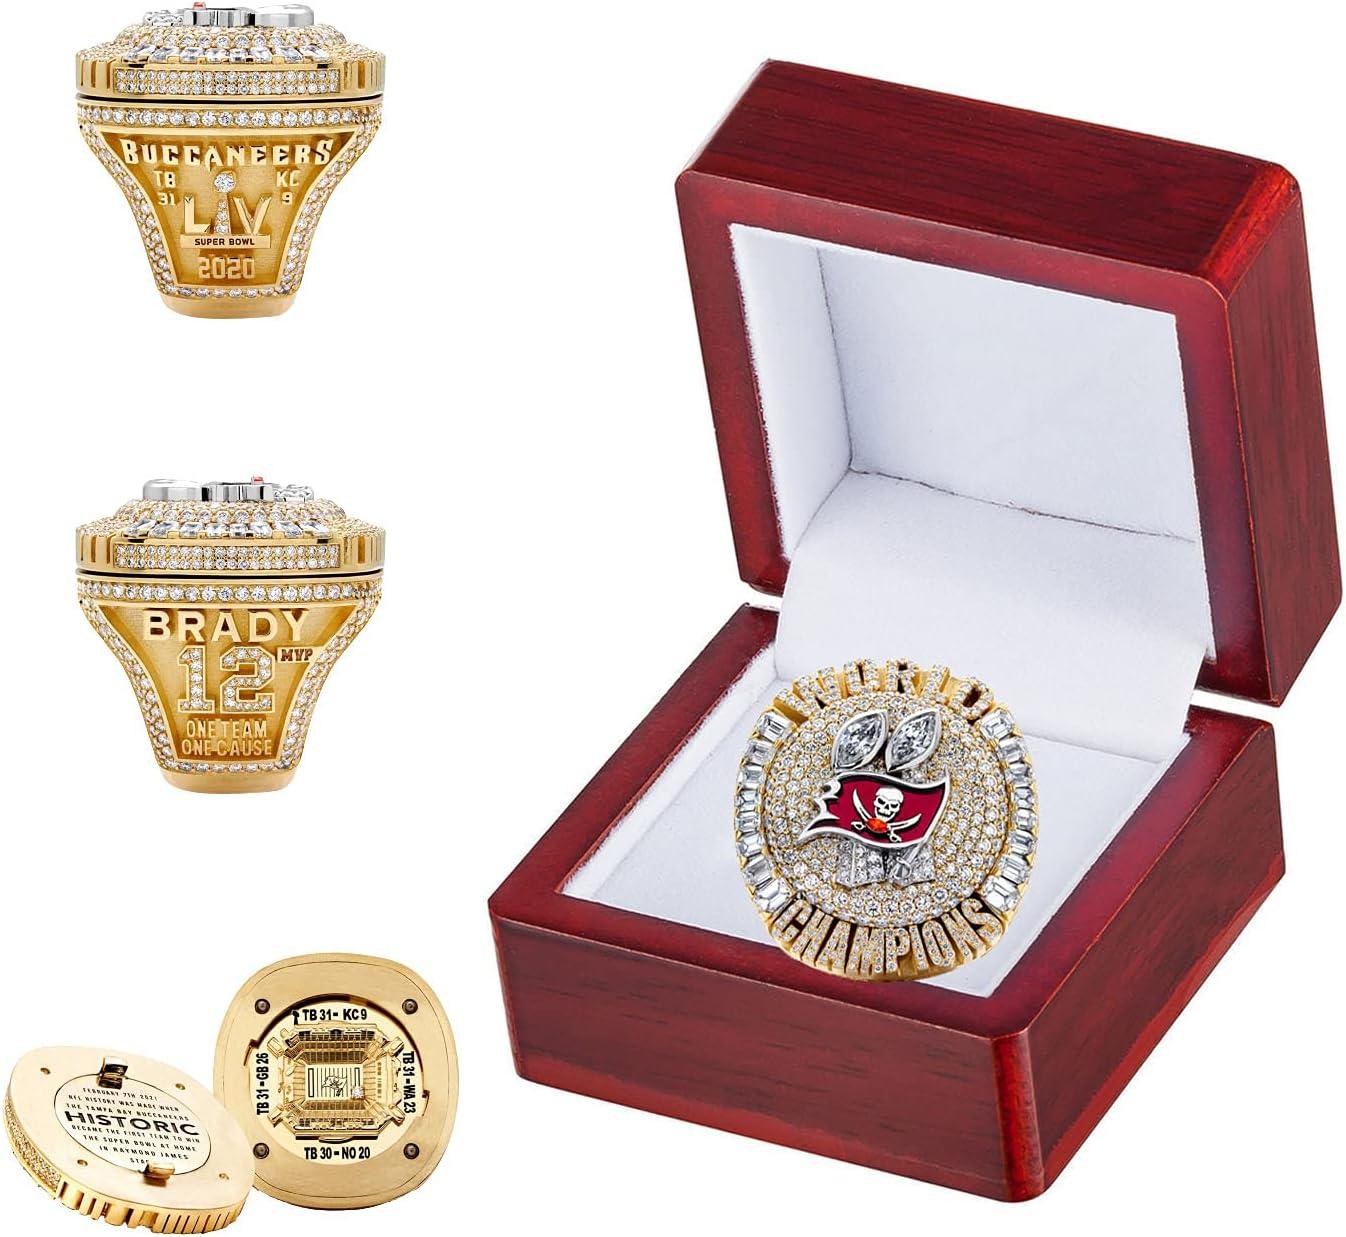 2020 Tampa Bay Super'Bowl Championship Ring con caja de madera 'Buccaneers Champions Ring' Tom 12 Brady'Goat Serie réplicas desmontables Regalos para hombres mujeres niños padre